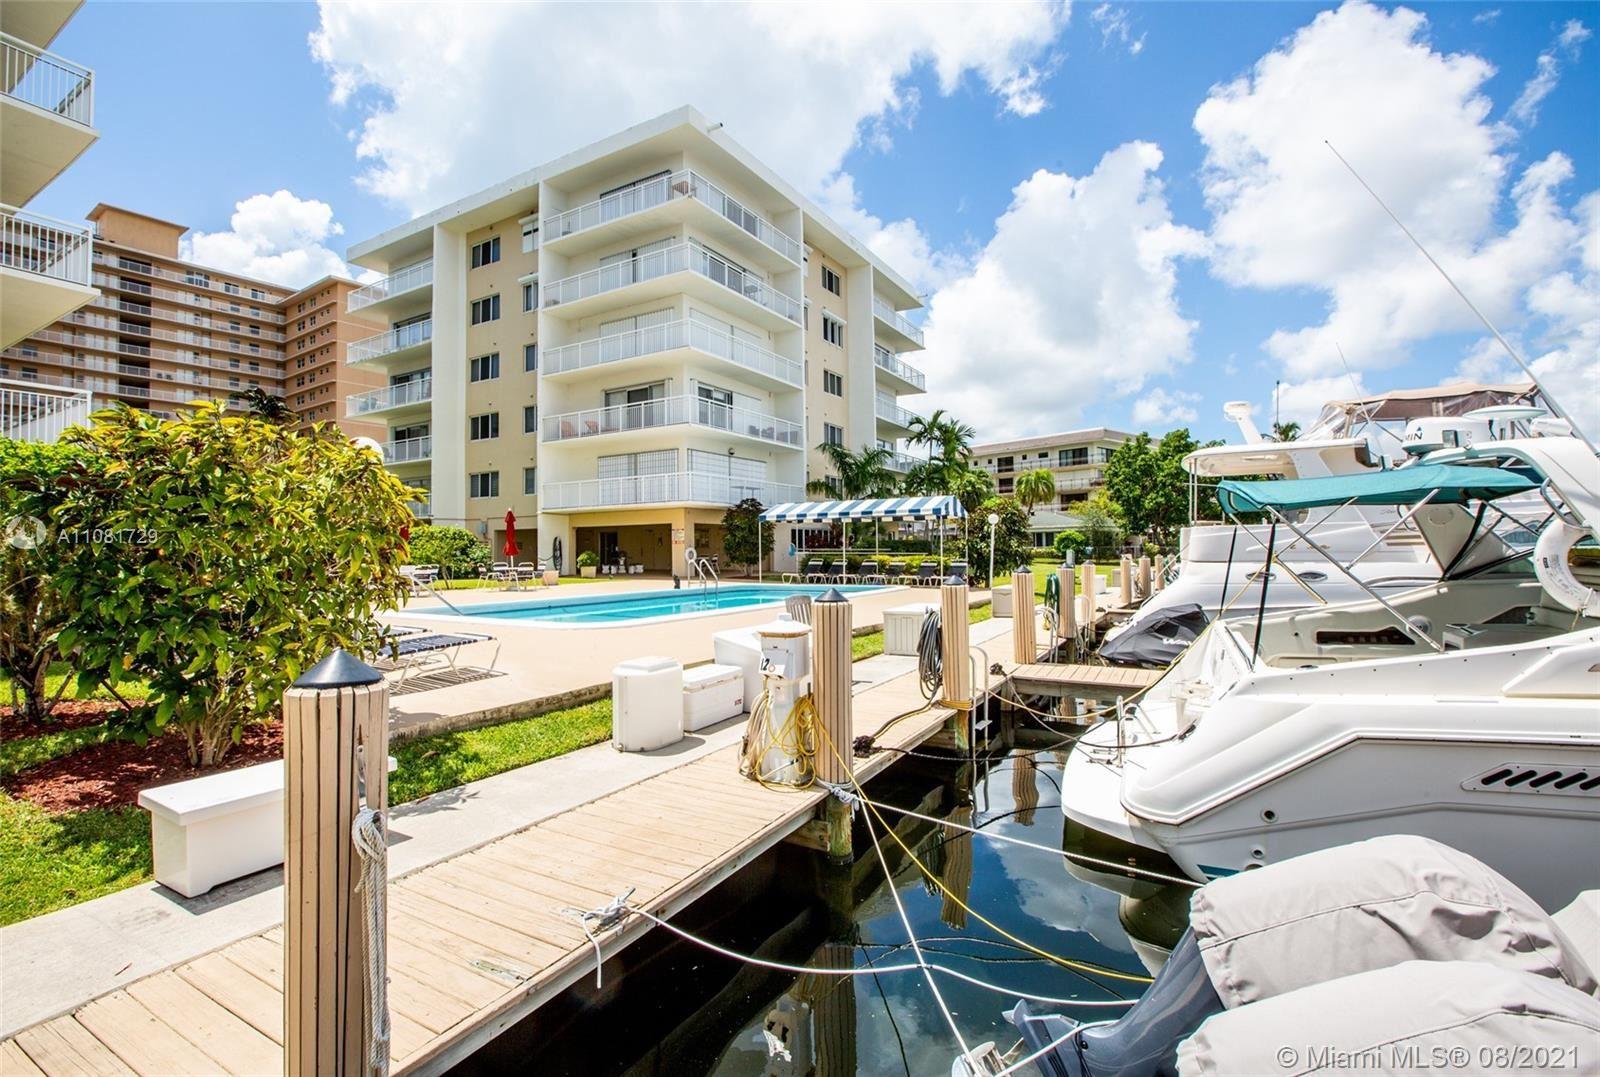 126 Golden Isles Dr #52A, Hallandale Beach, FL 33009 - #: A11081729